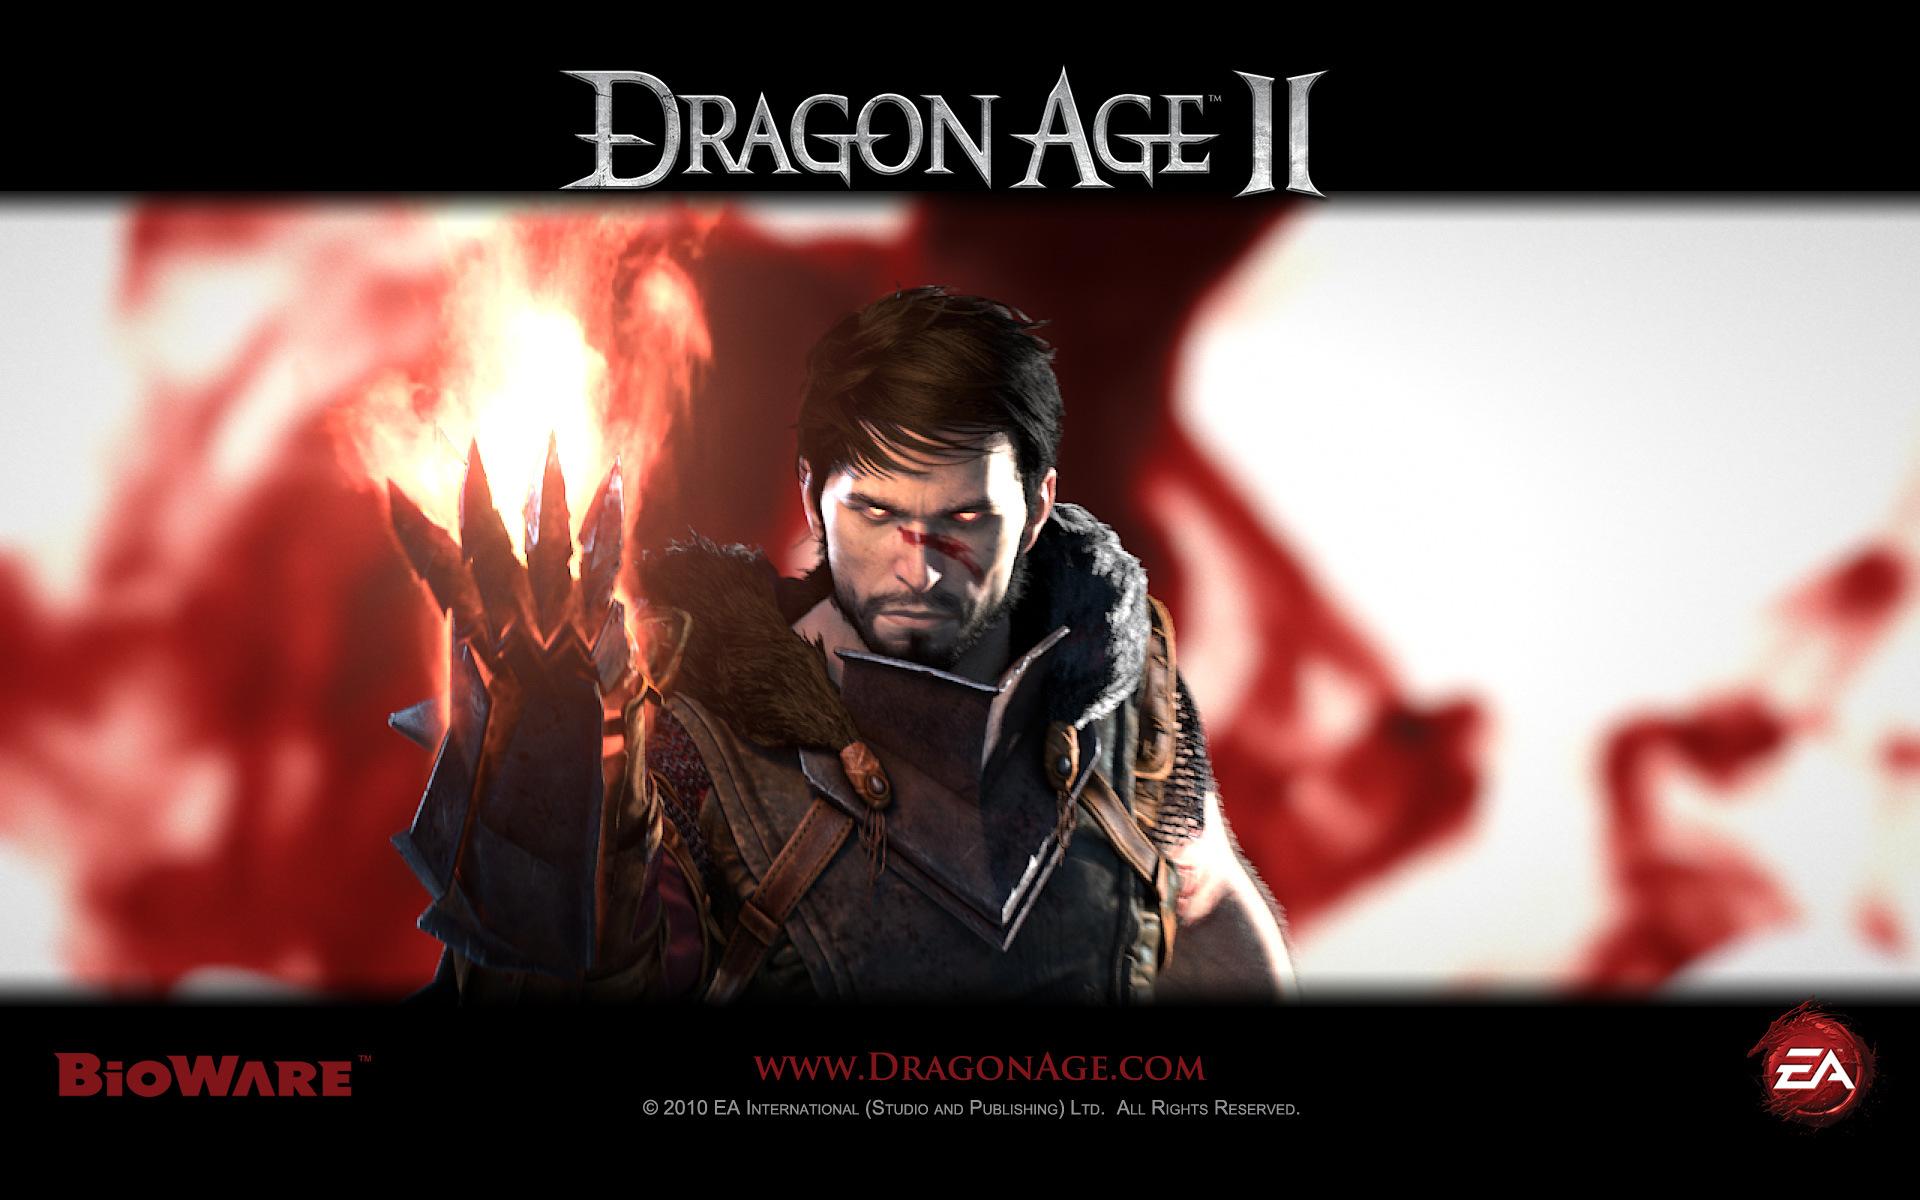 dragon-age-2-06-1920x1200.jpg